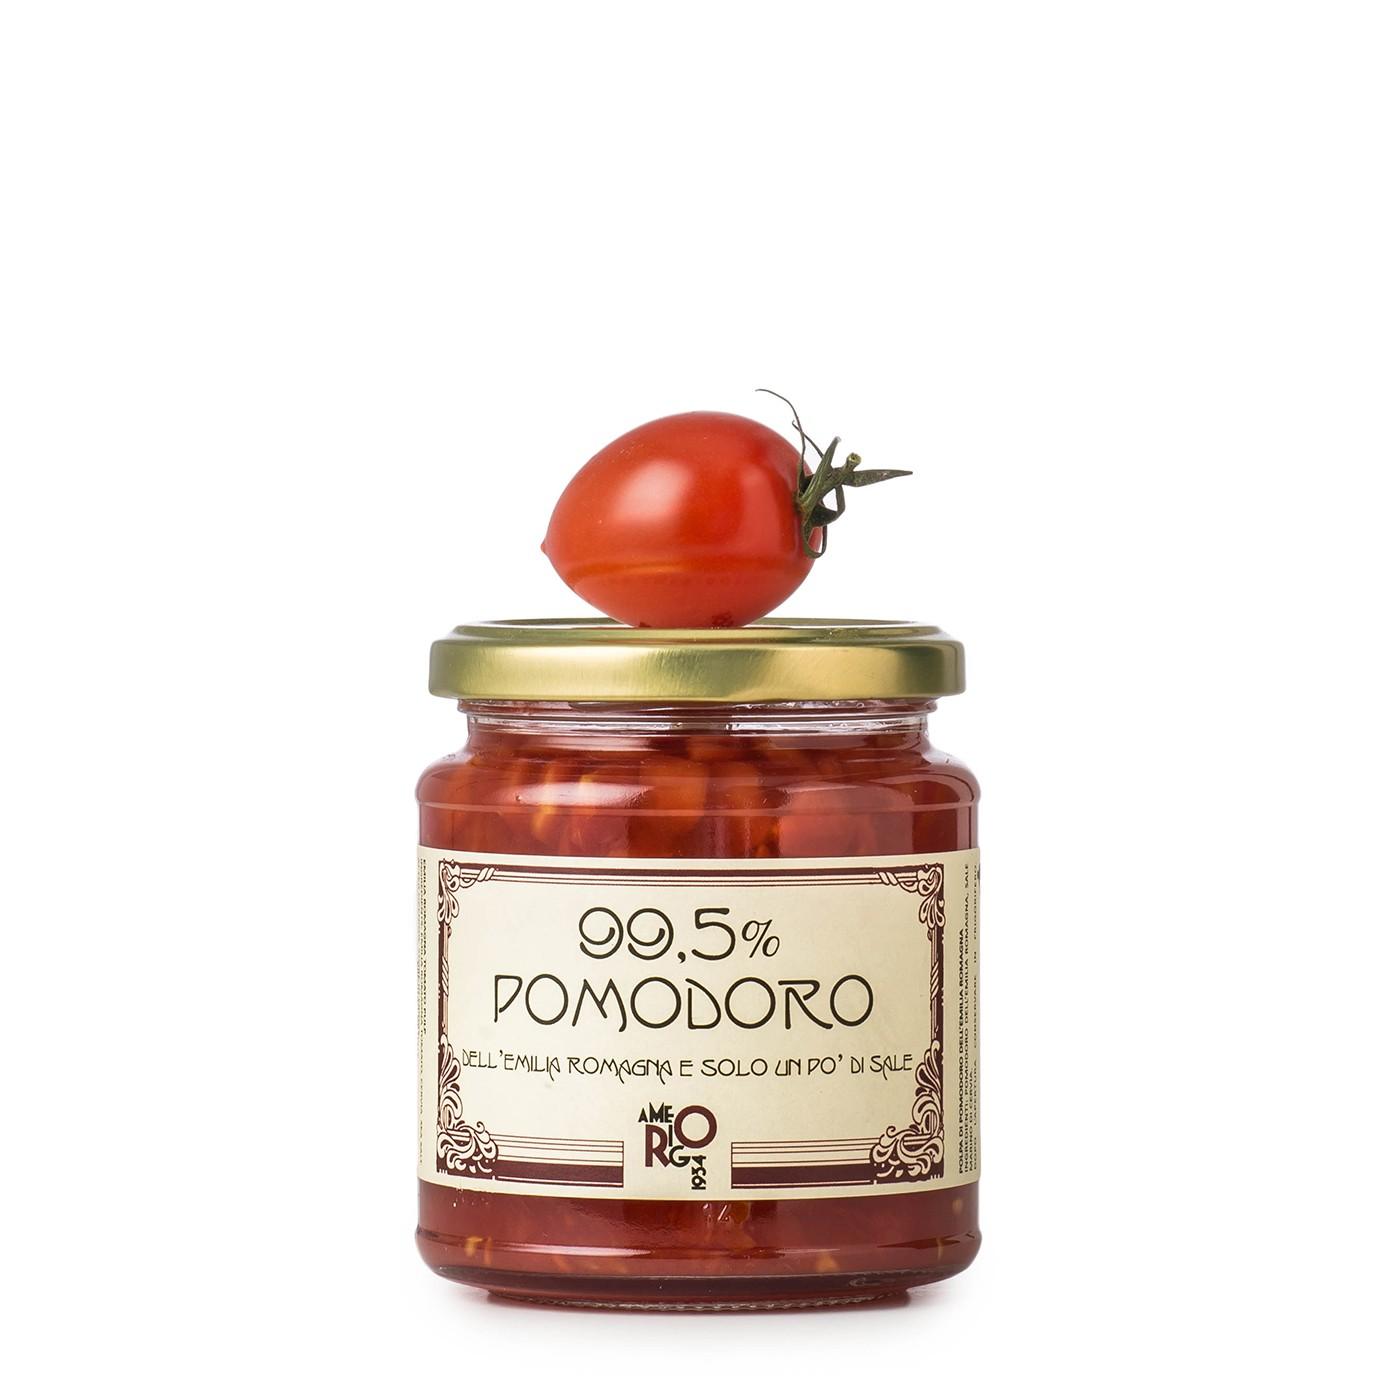 Emilia Romagna Tomato Sauce 99.5% 9.5 oz